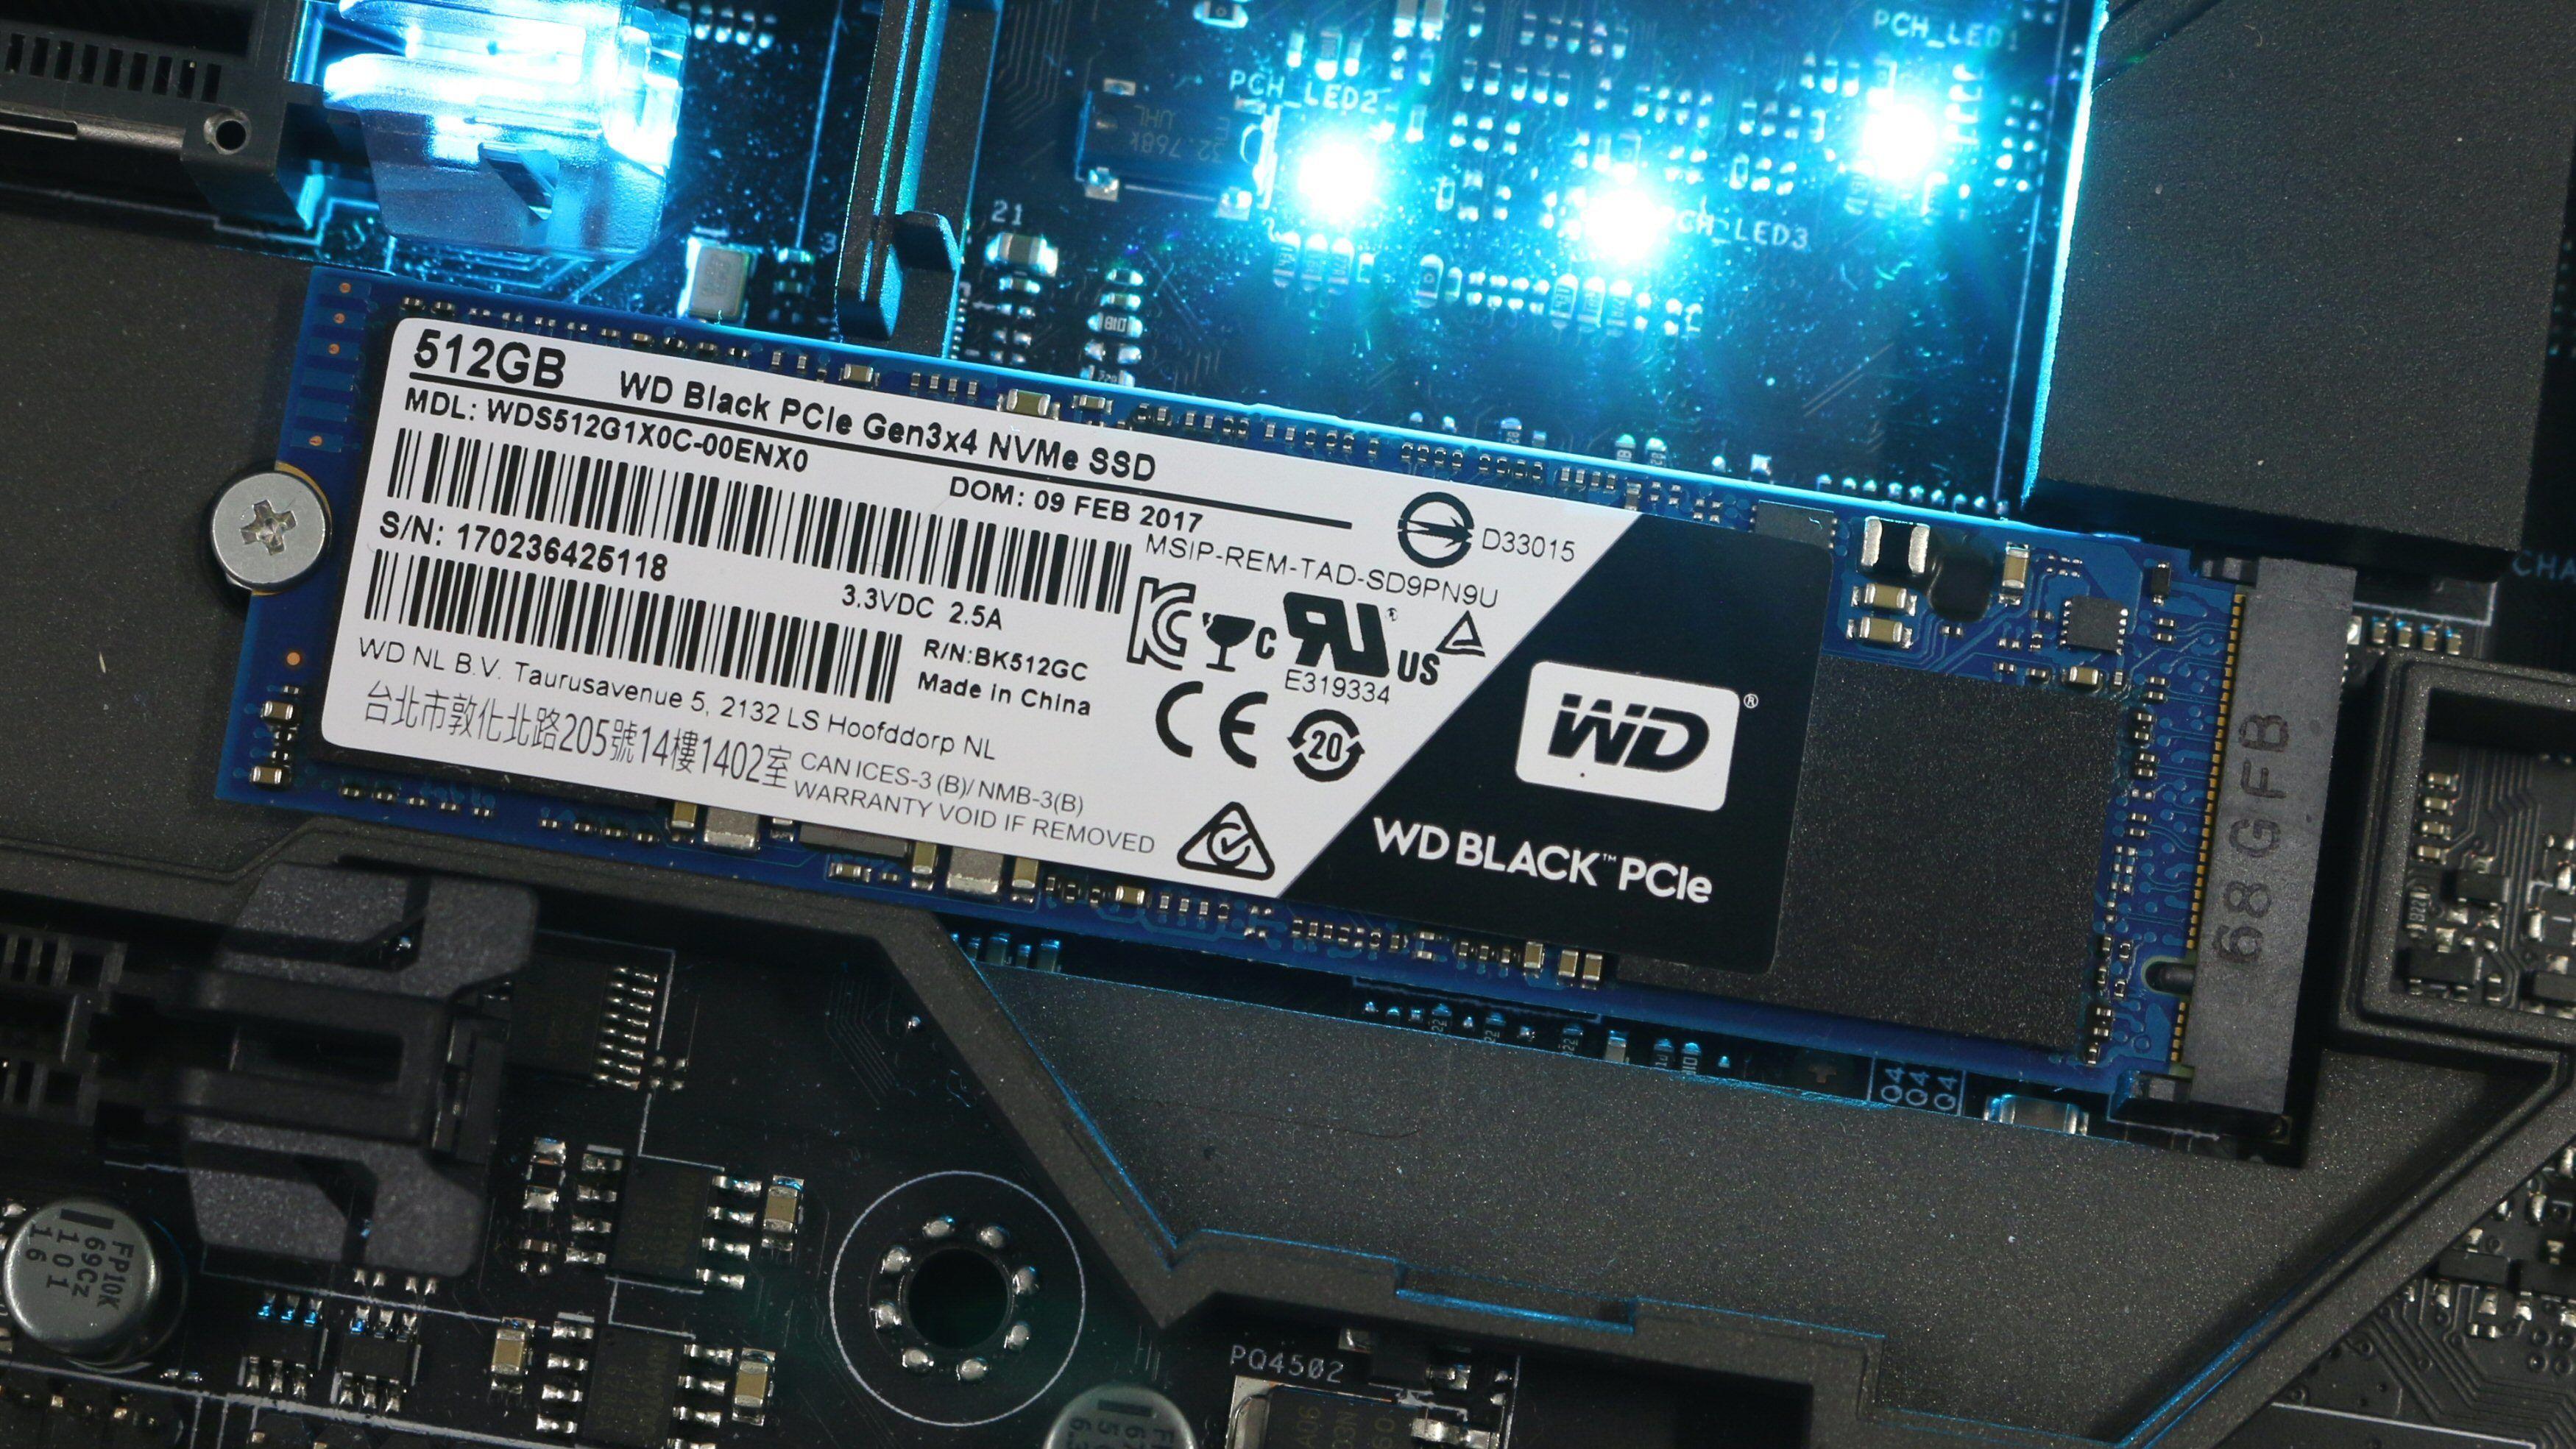 WD Black PCIe SSD